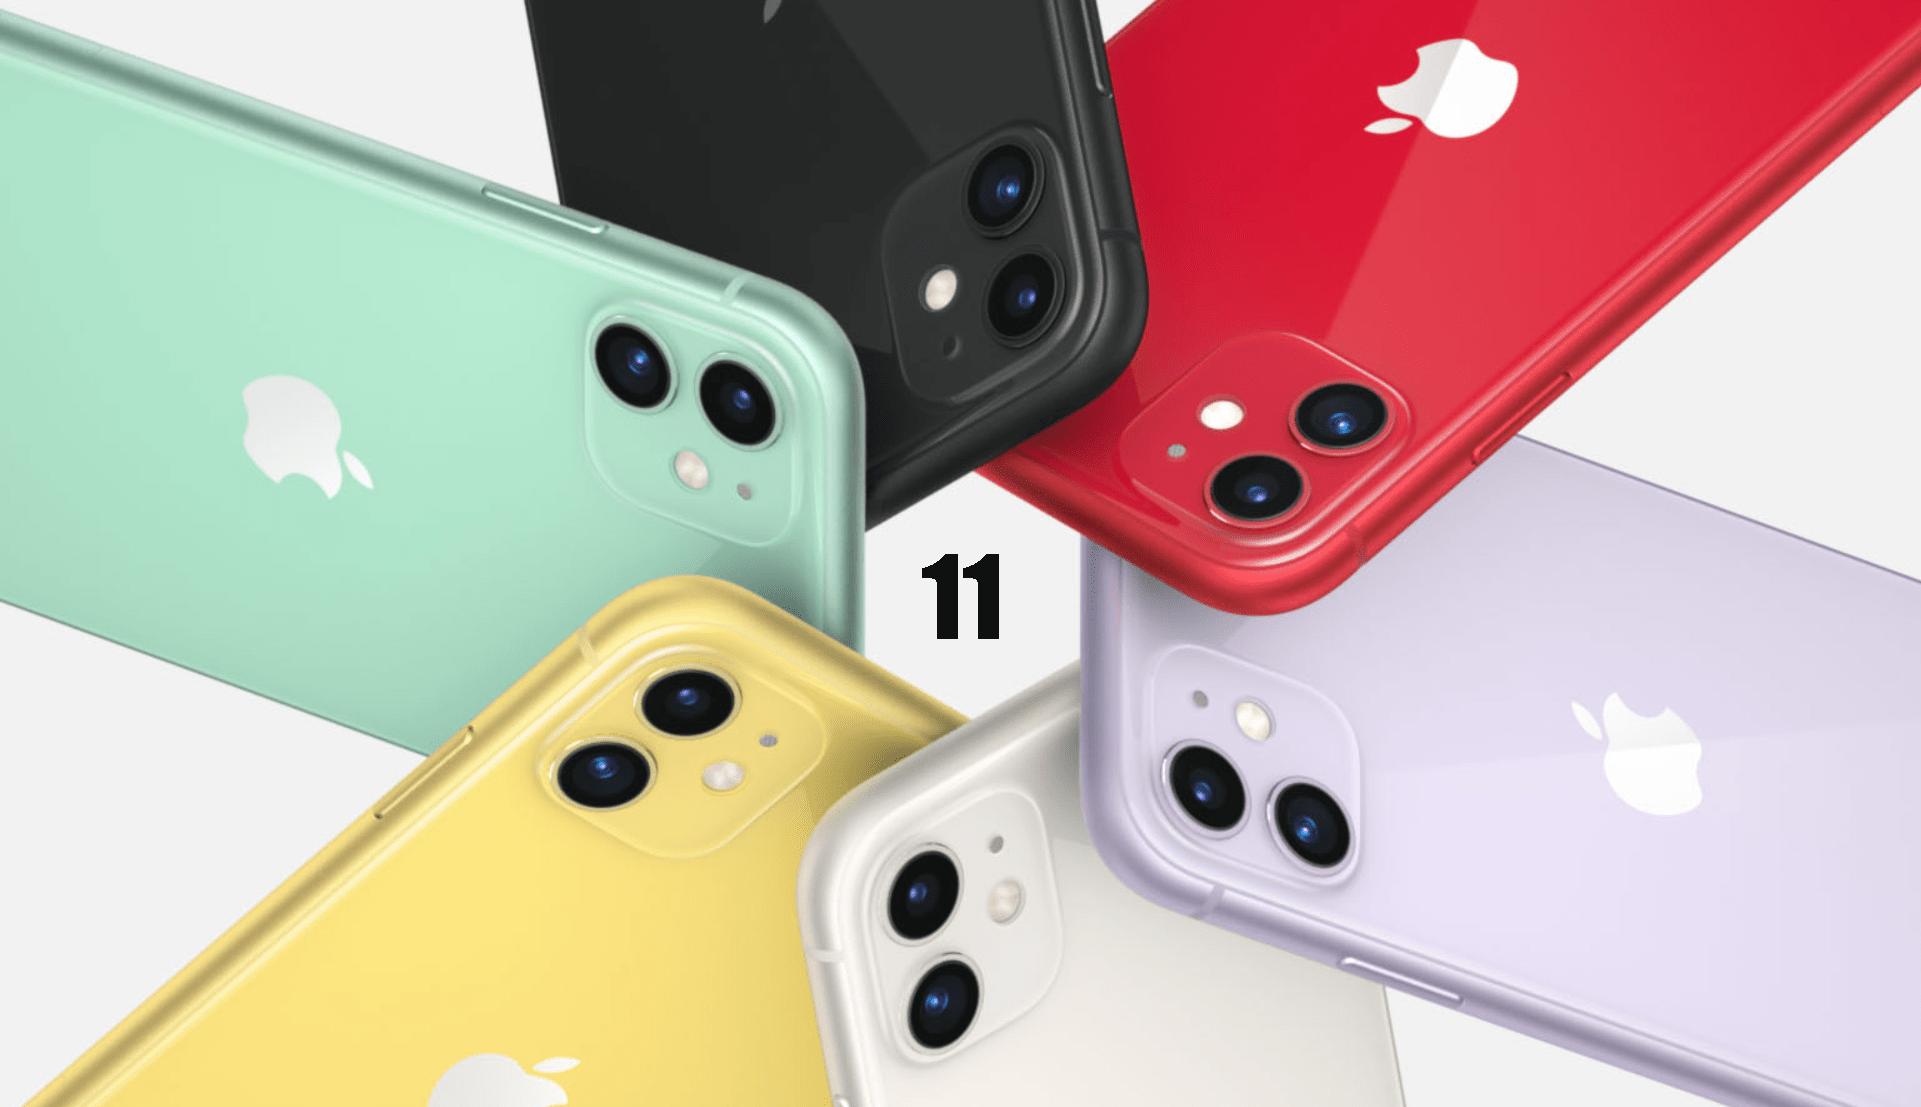 iPhone 11 - TelOneiPhone.fr